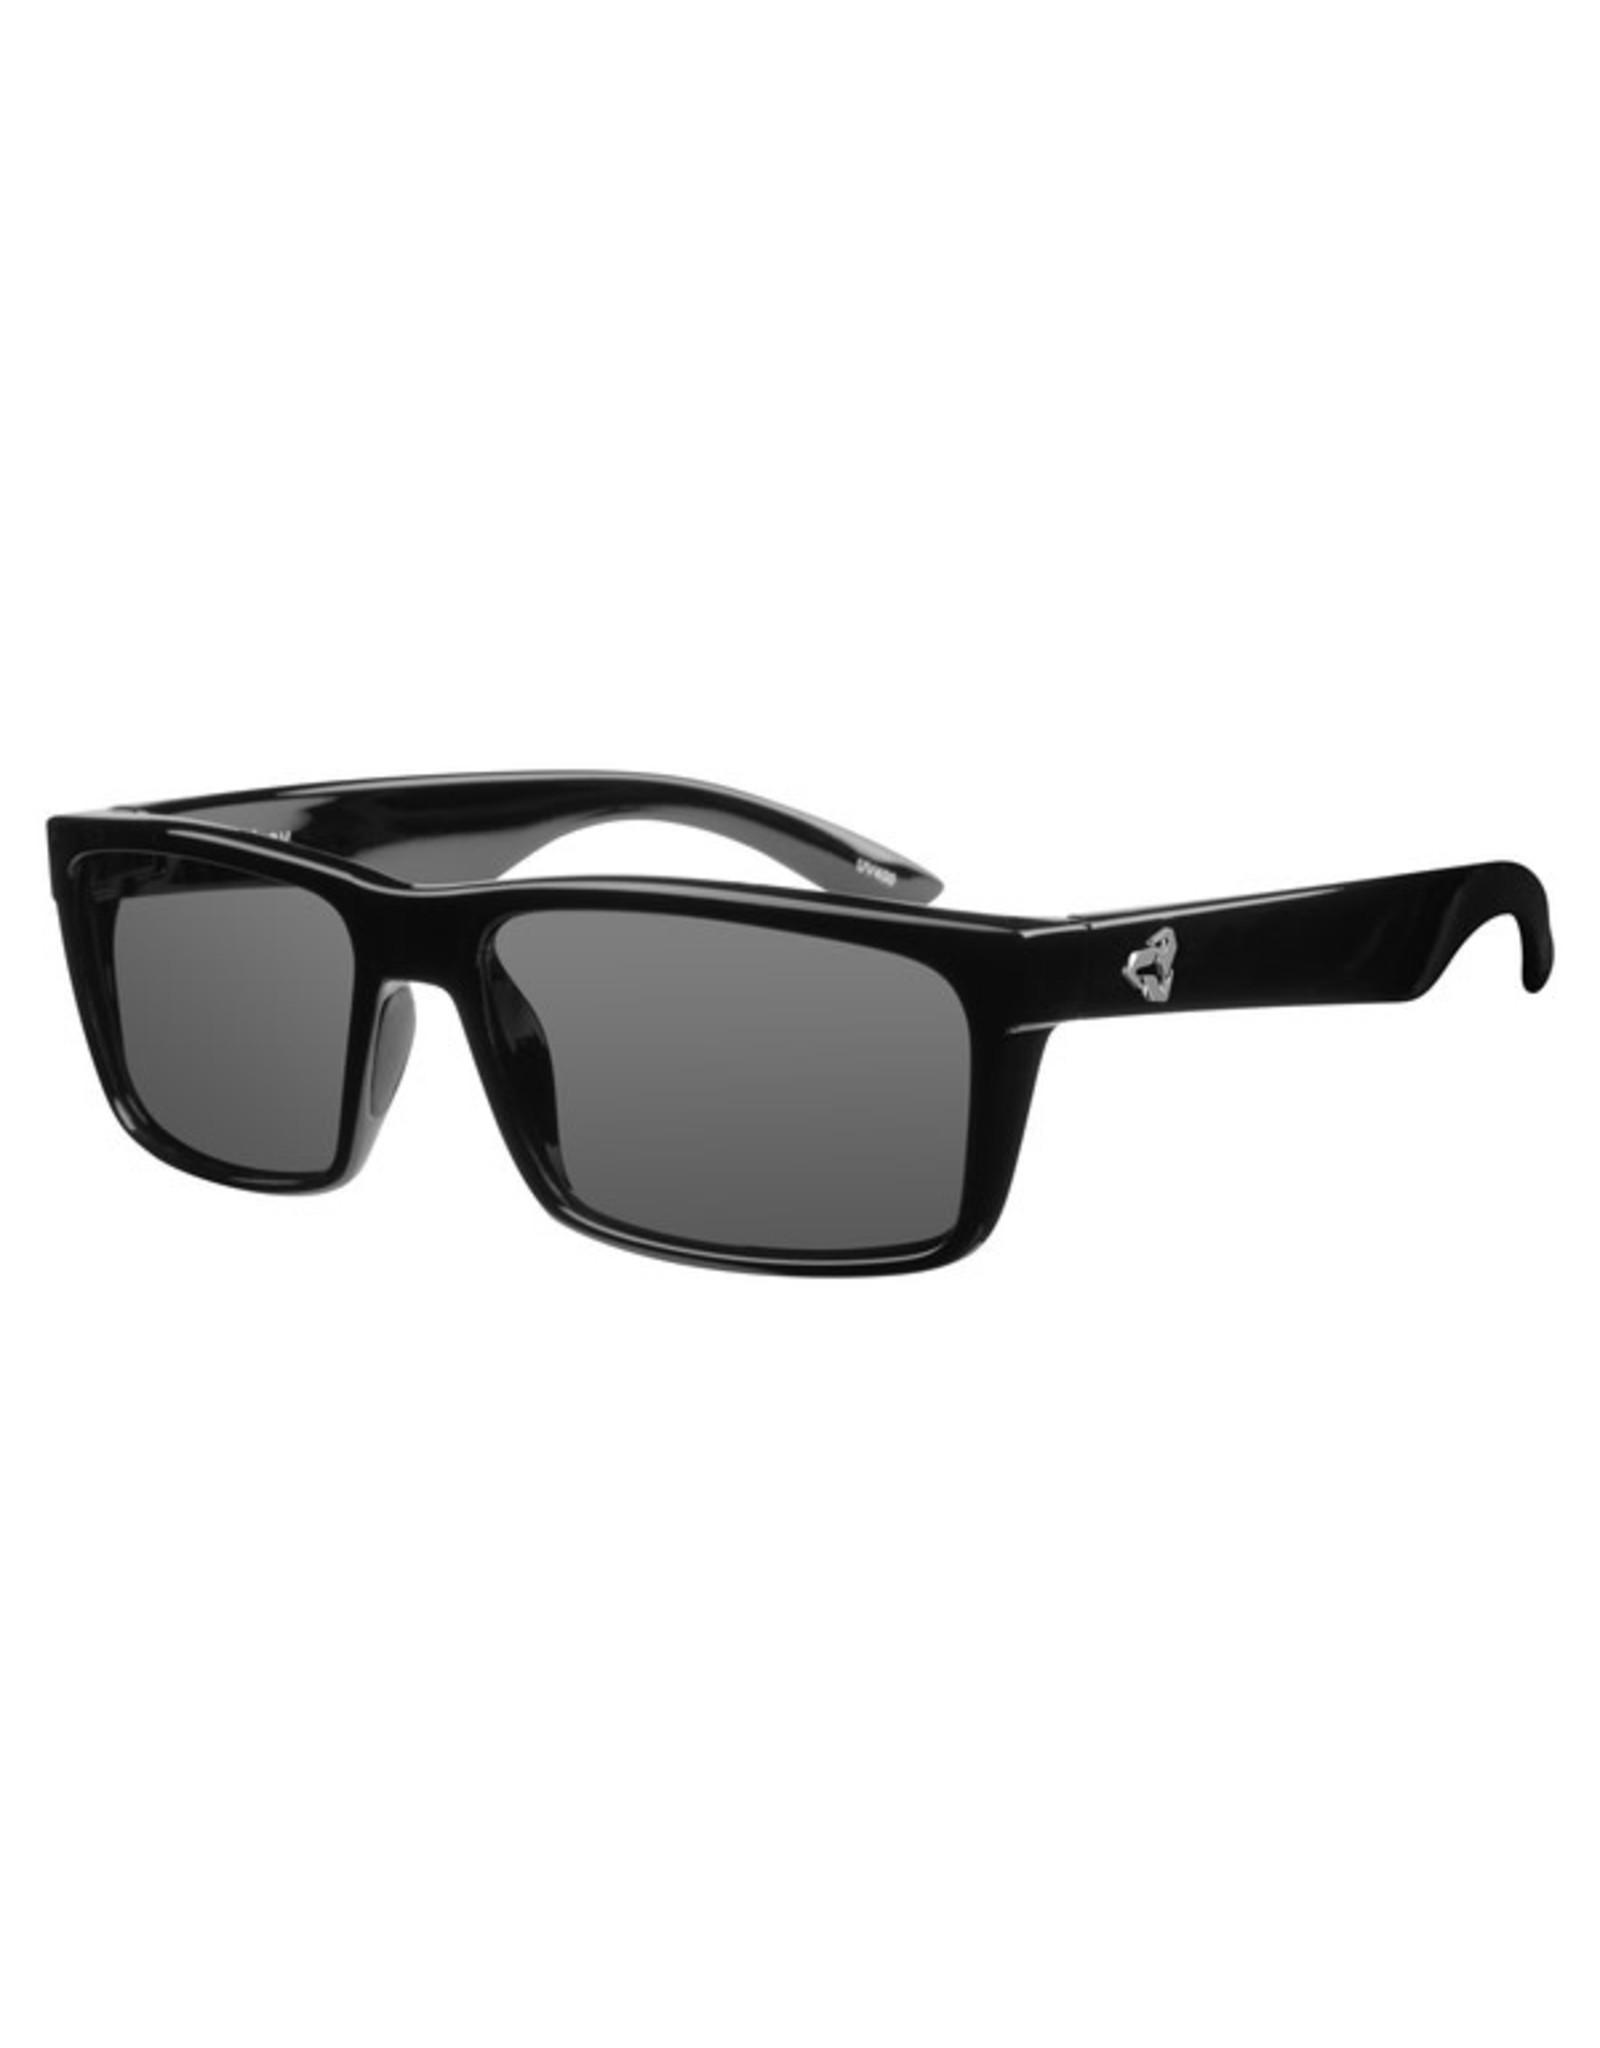 Ryders Eyewear Ryders Hillroy Core Lens S19